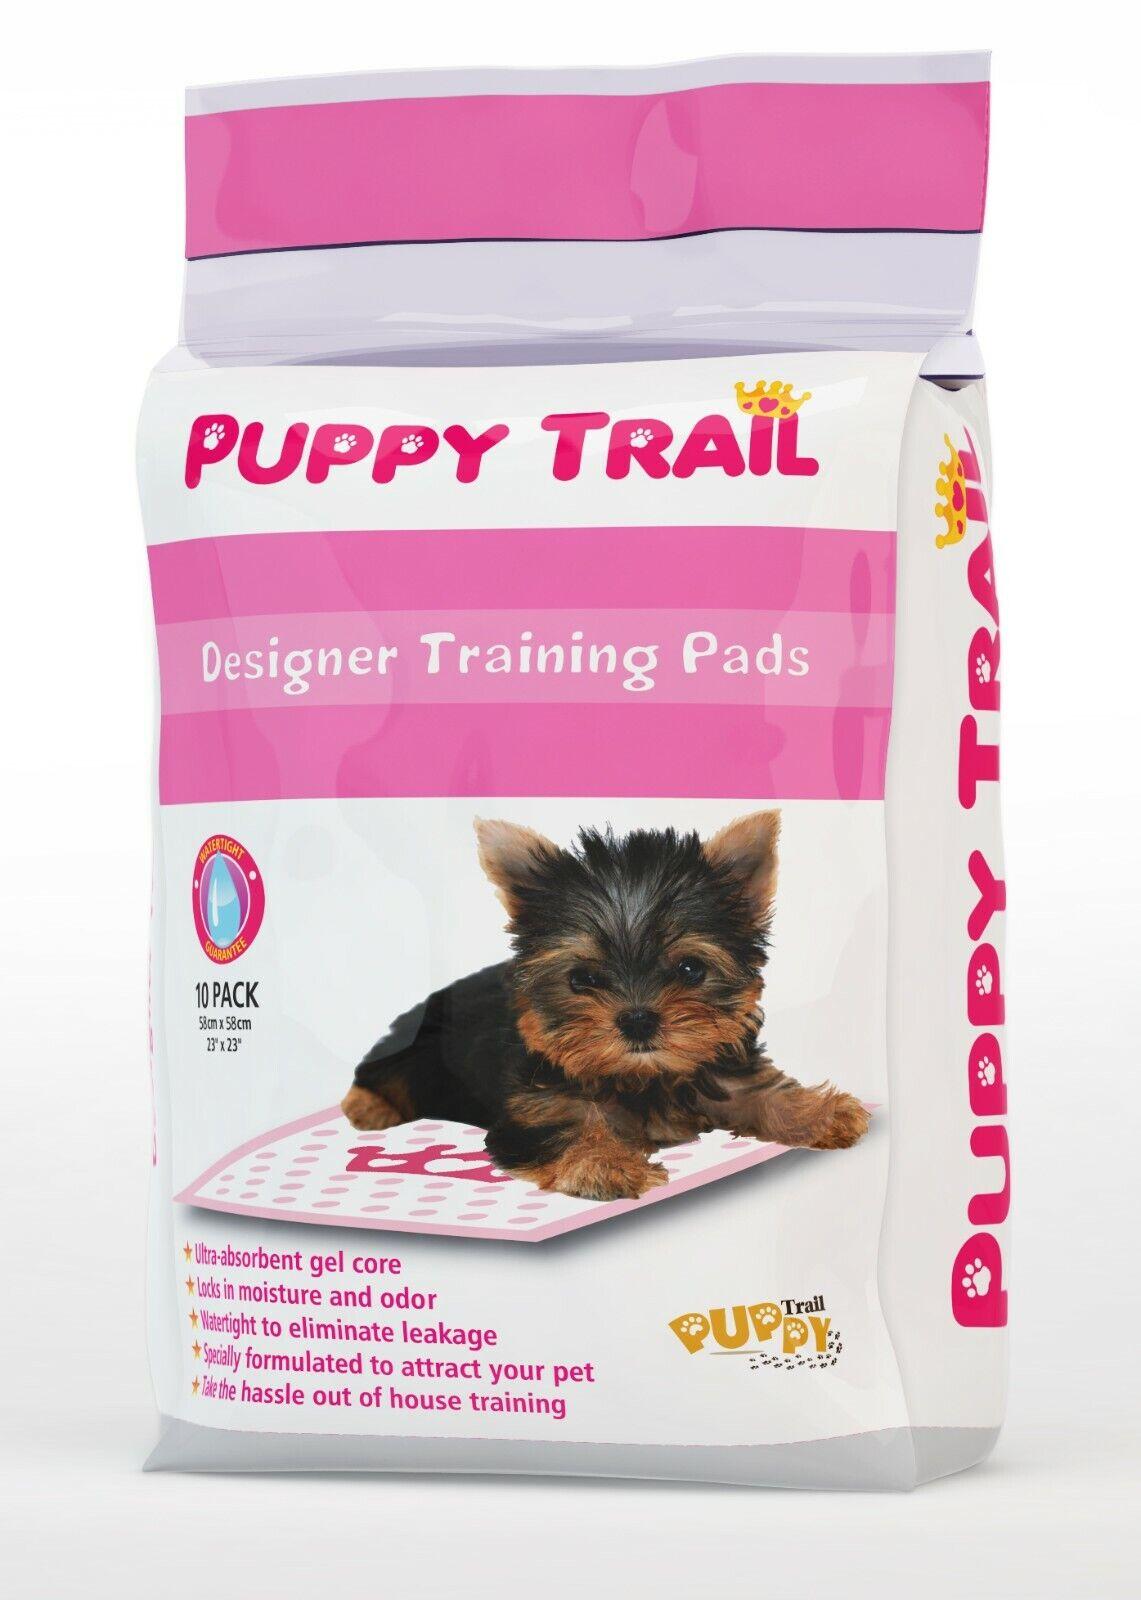 Pink Puppy Pads Case- Puppy Trail Designer Pads -120 Puppy Pads 12 - 10 Packs  - $39.99